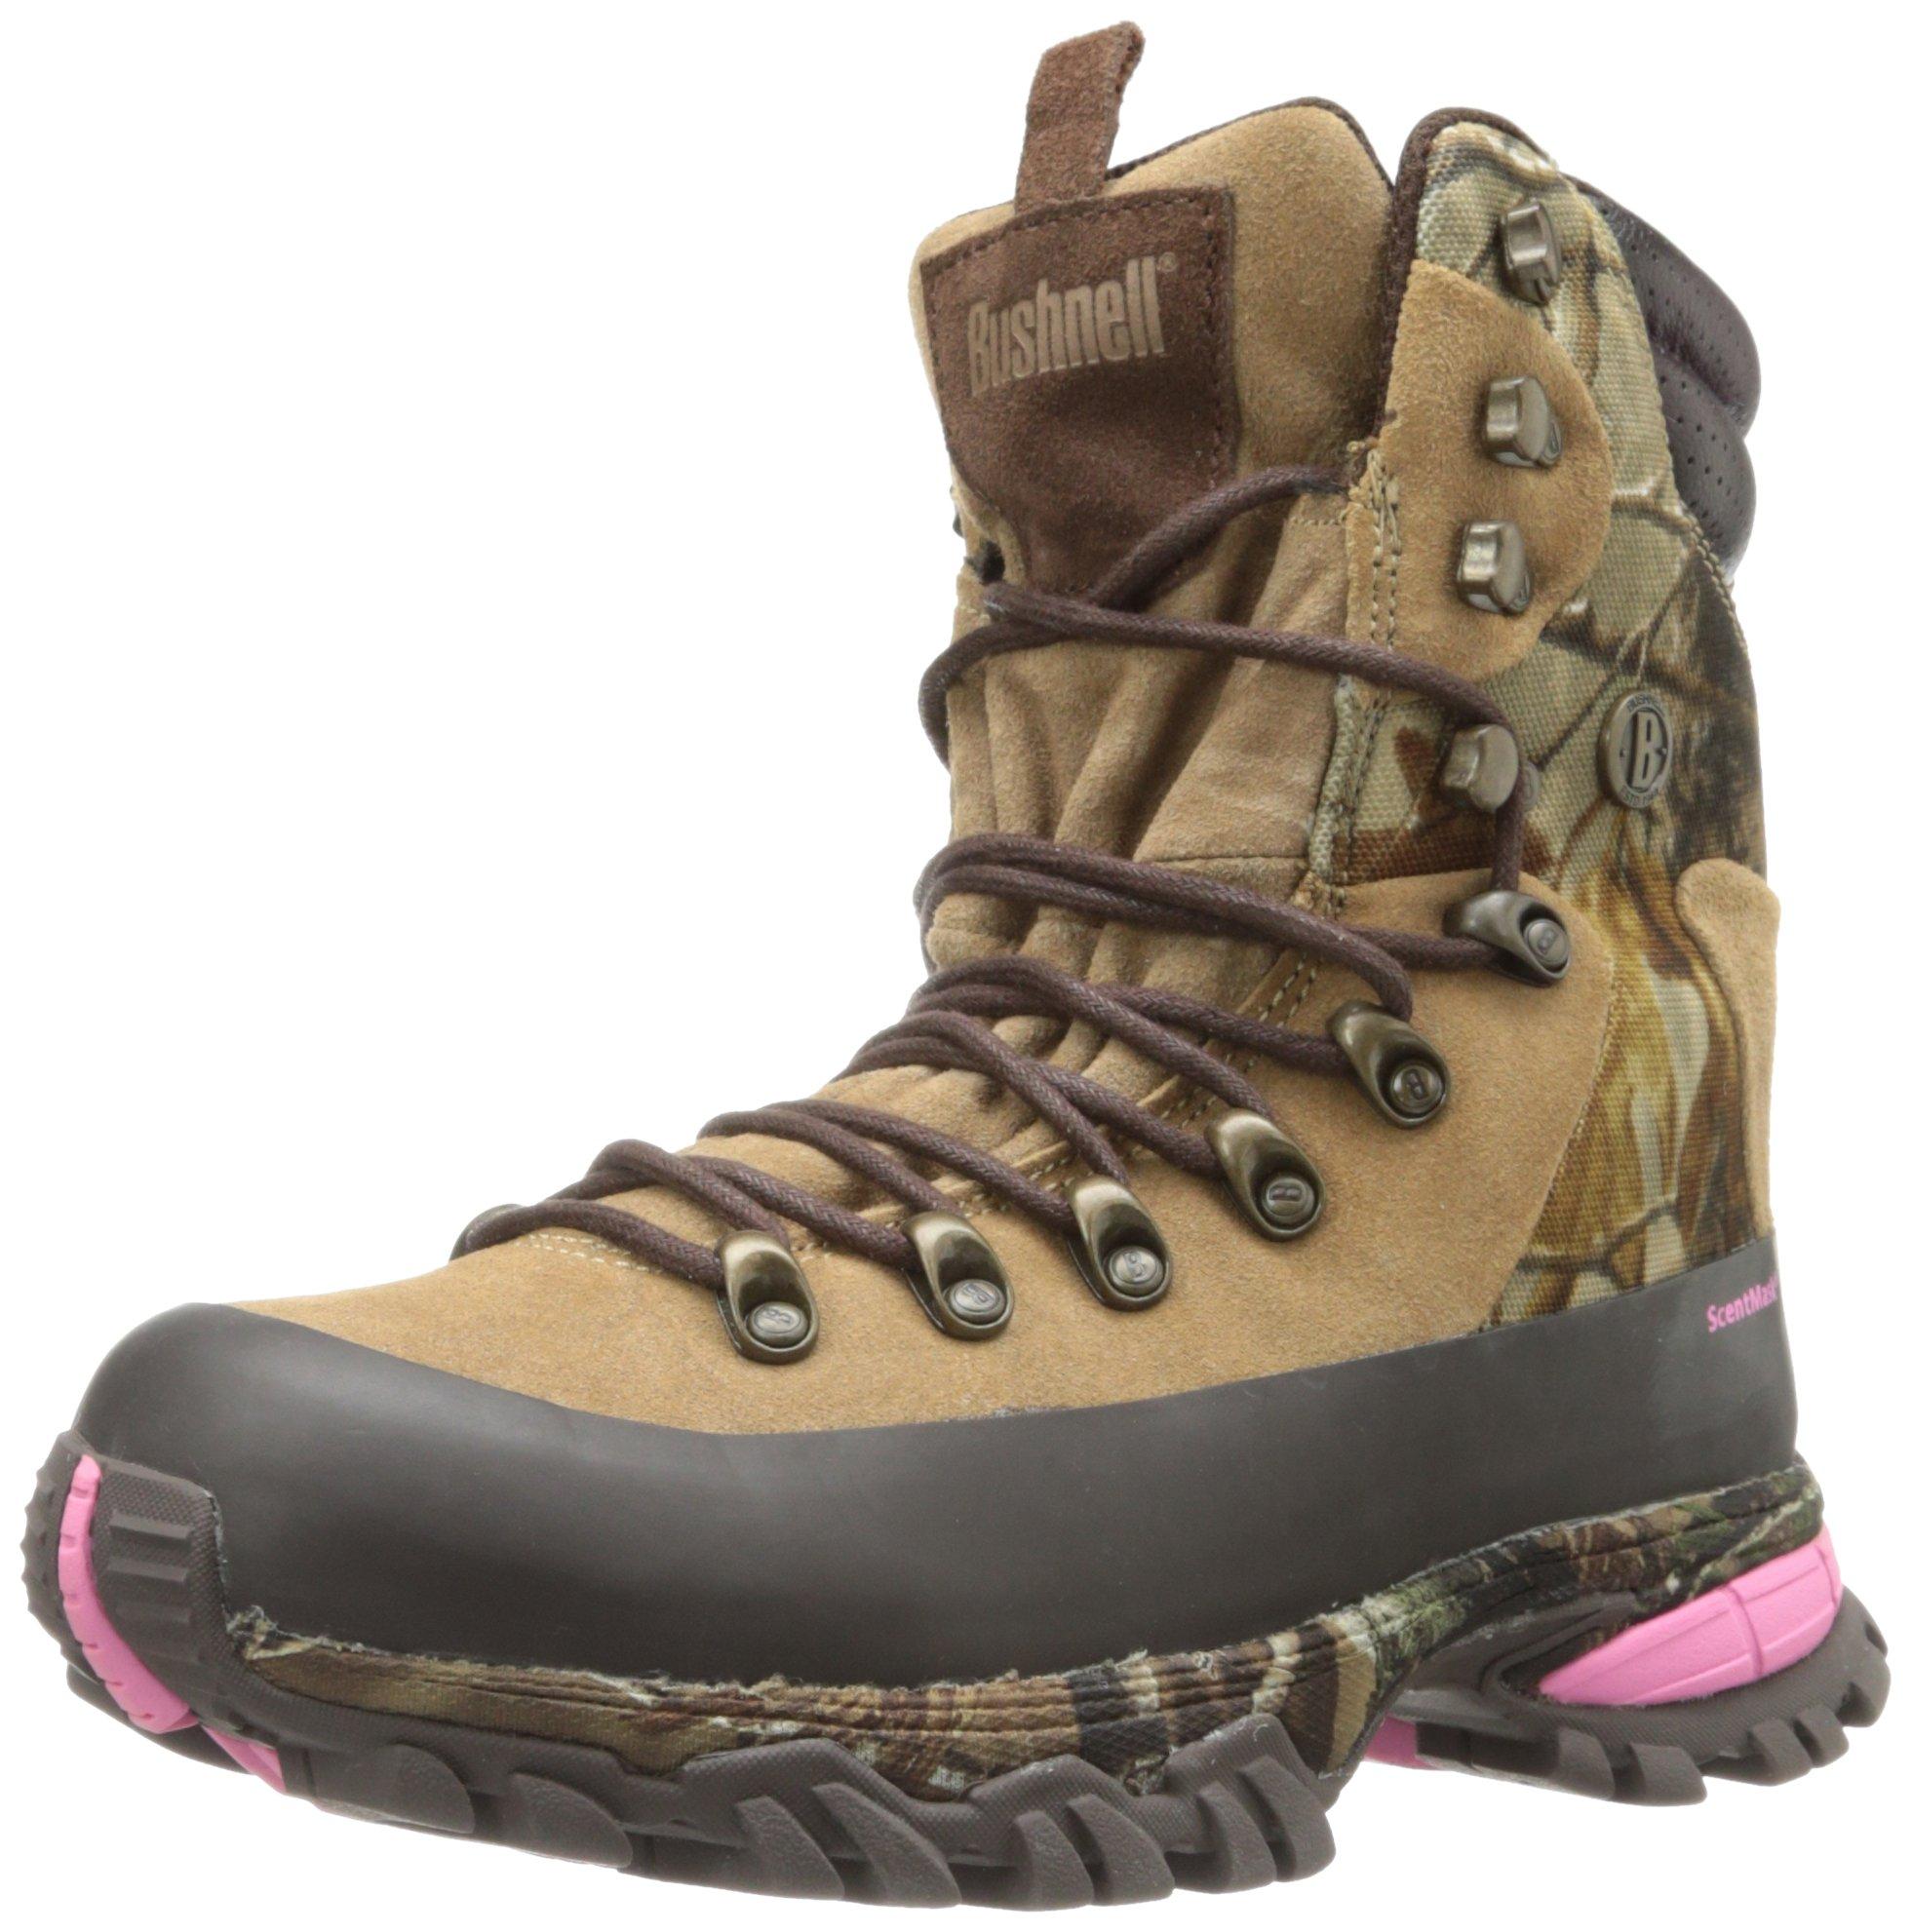 Bushnell Women's Sierra High Hunting Boot,Realtree,5 M US